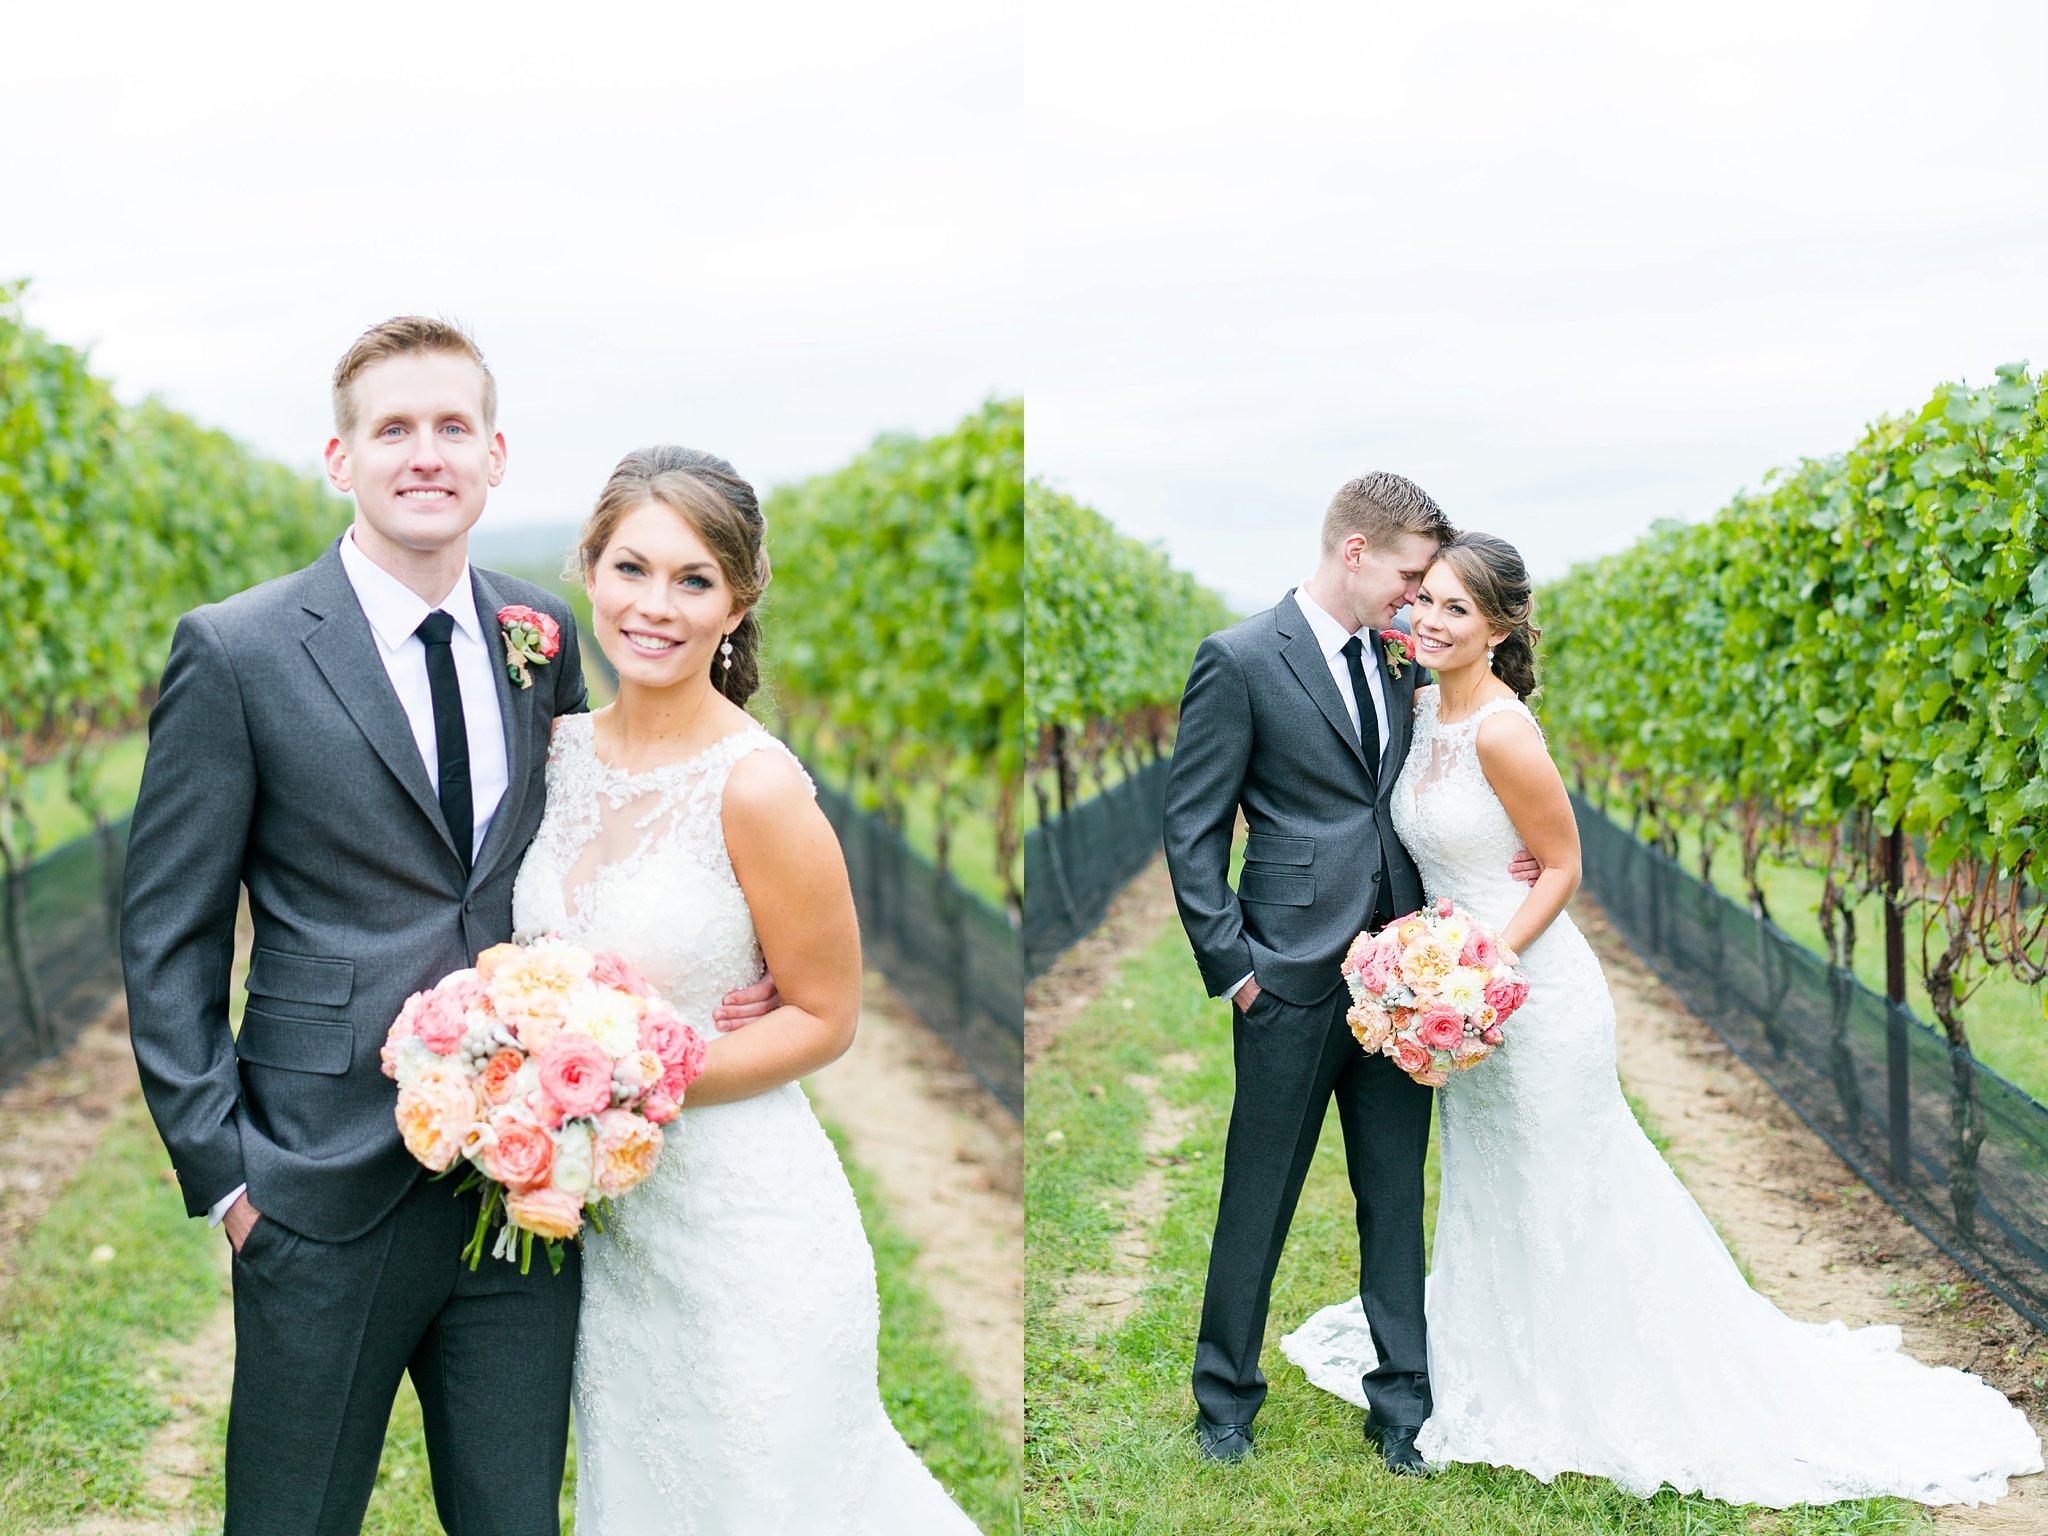 Stone Tower Winery Wedding Photos Virginia Wedding Photographer Megan Kelsey Photography Sam & Angela-208.jpg